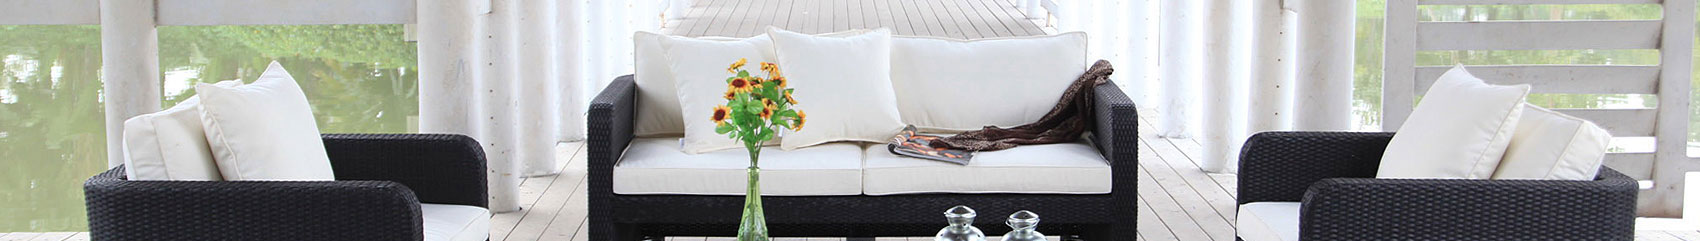 Grosse Lounge Rattan kaufen - Rattan Gartenmöbel